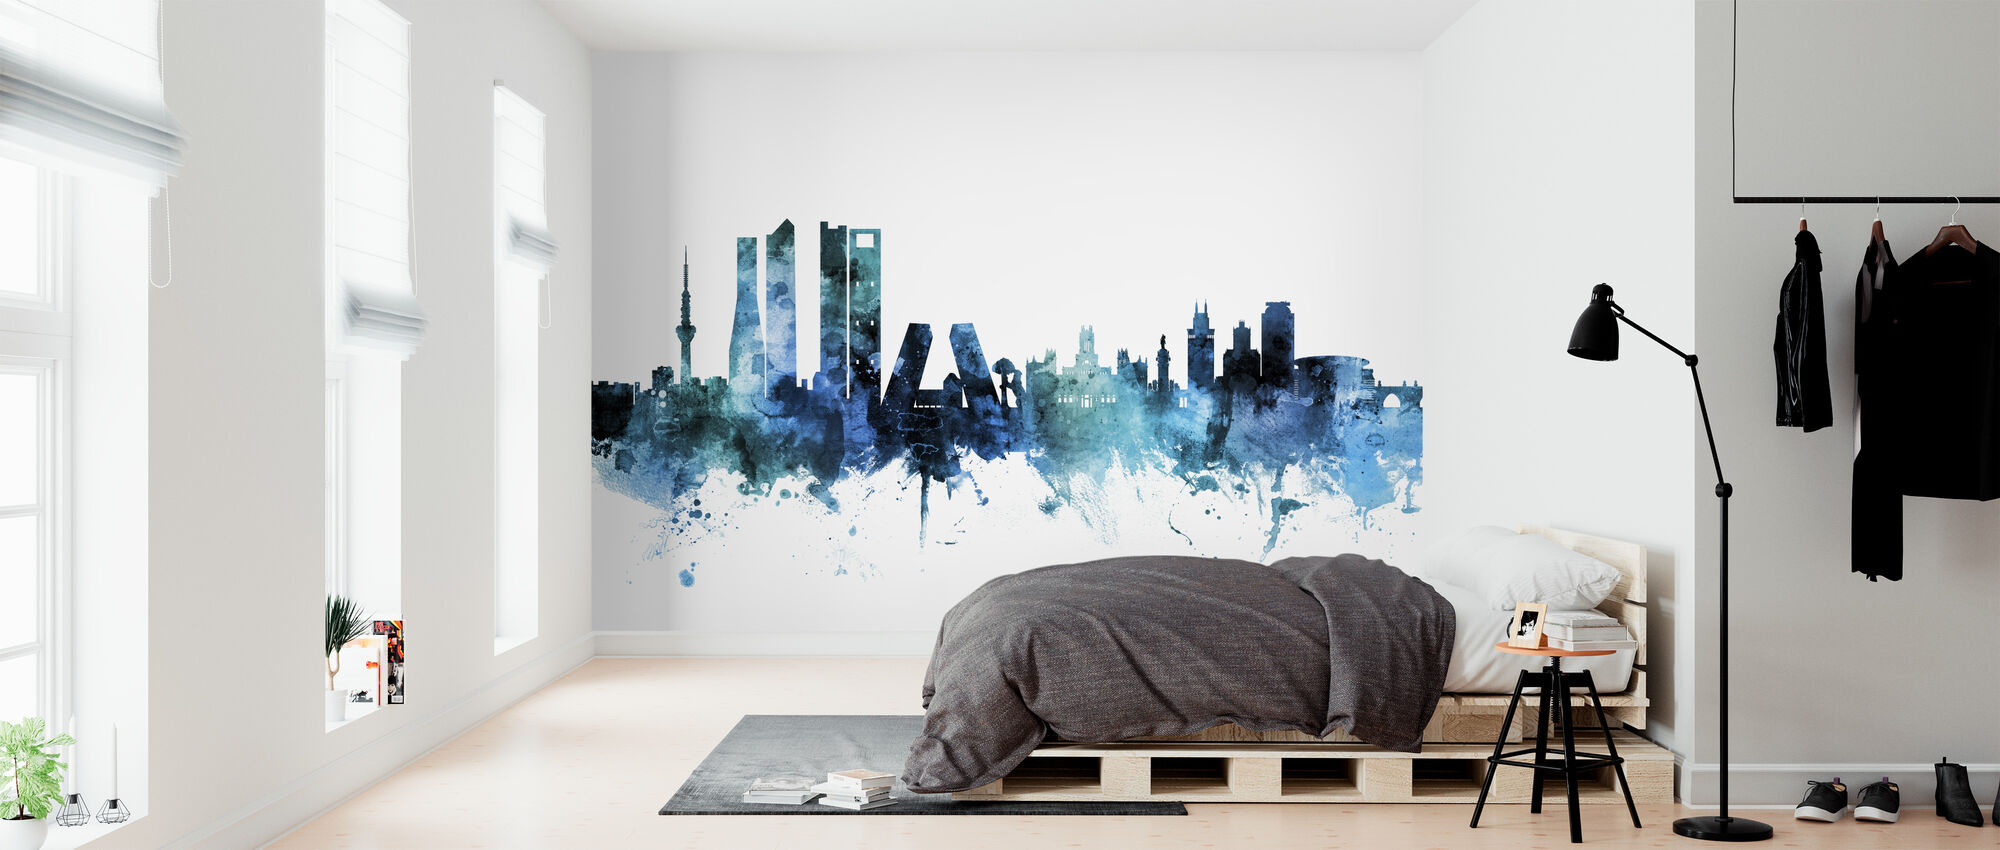 Madrid España Skyline - Papel pintado - Dormitorio